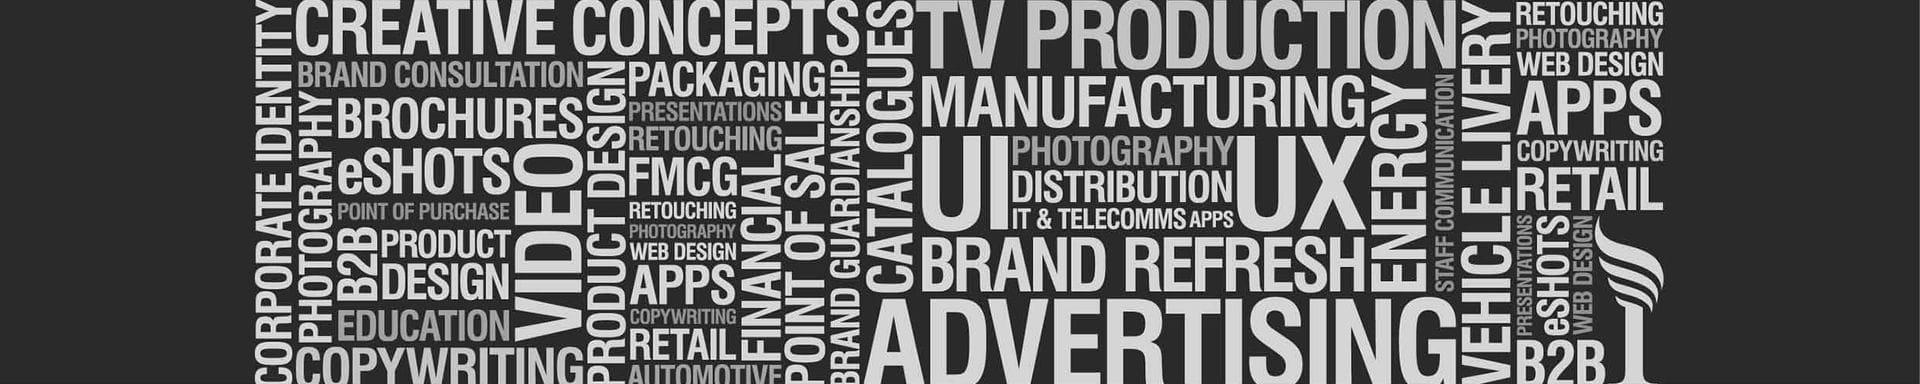 Creative 3.1 Banner